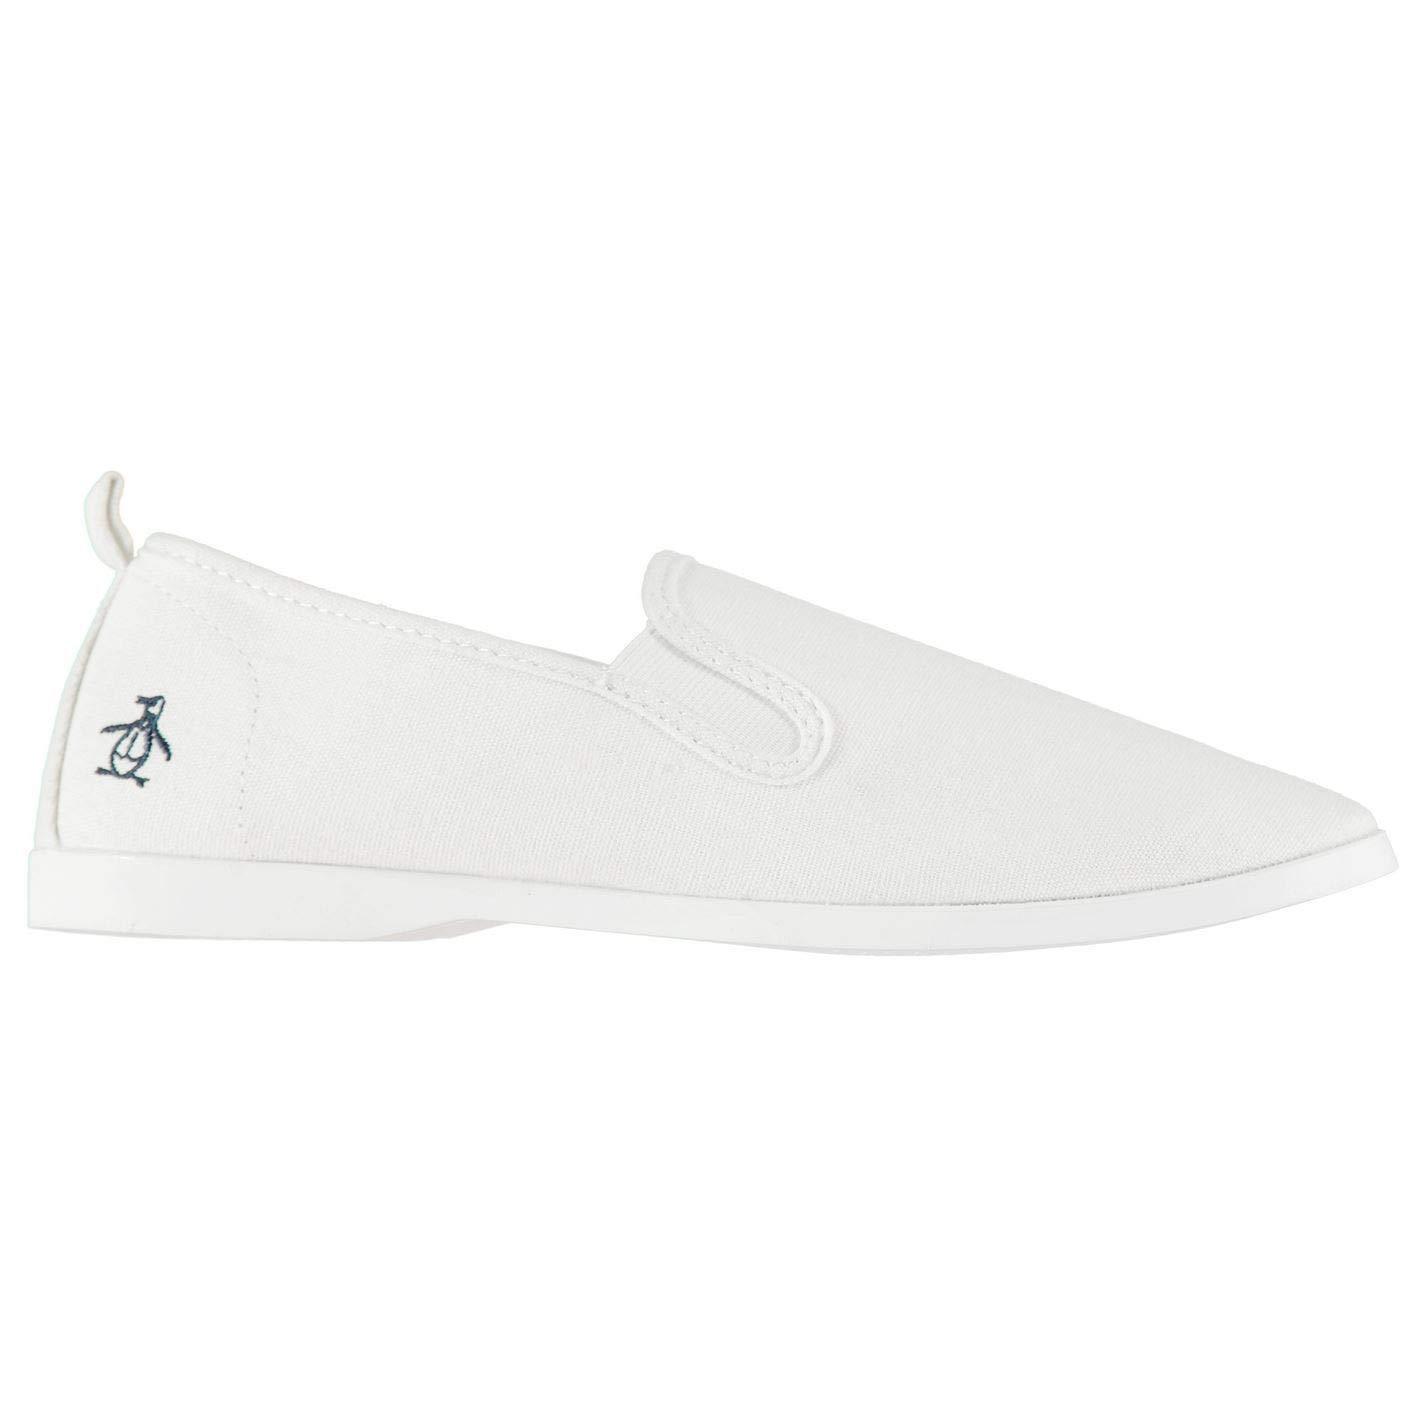 be8b049b2fba0 Amazon.com | Original Penguin Norris Slip On Pump Trainers Mens Athleisure  Shoes Sneakers | Fashion Sneakers